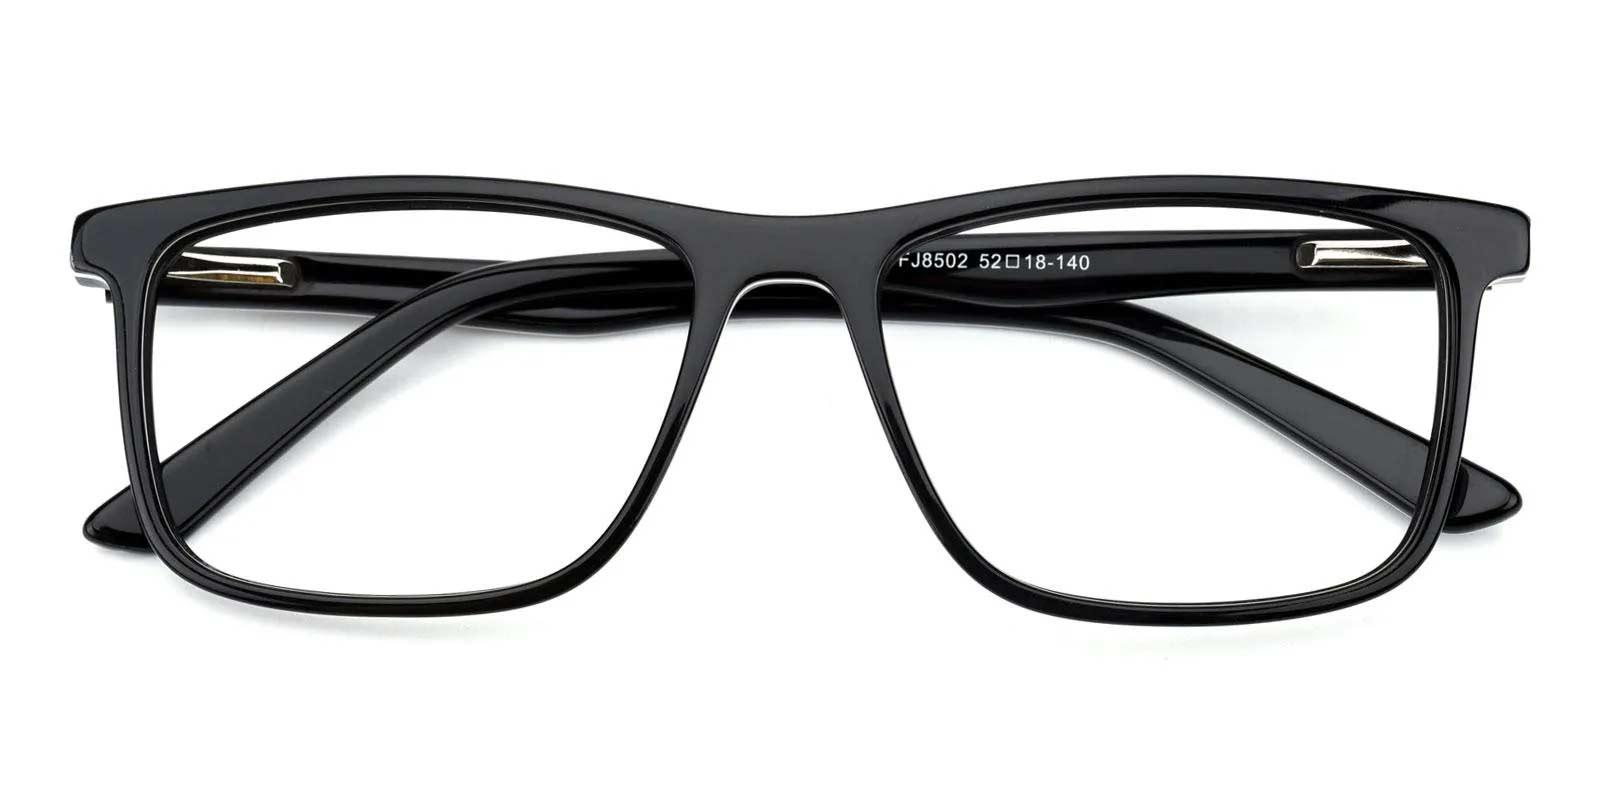 Tripper-White-Square-Acetate-Eyeglasses-detail